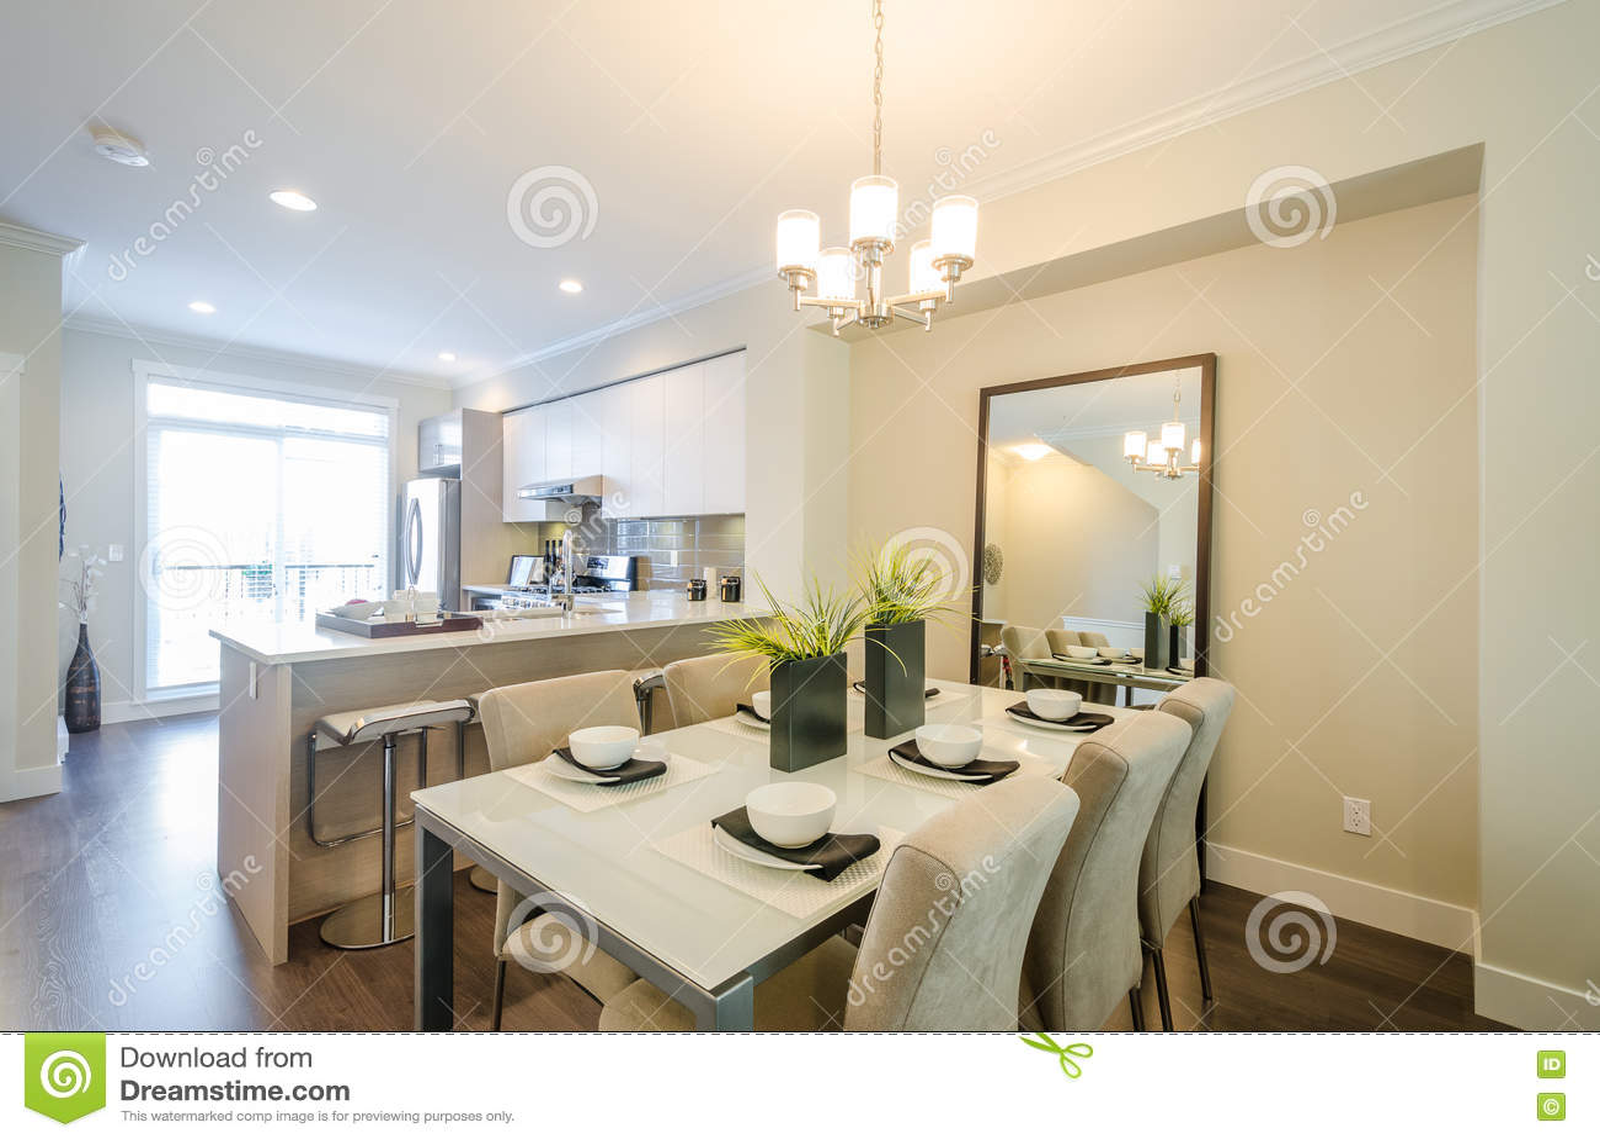 Sala da pranzo e cucina moderne immagine stock immagine for Cucina con sala da pranzo